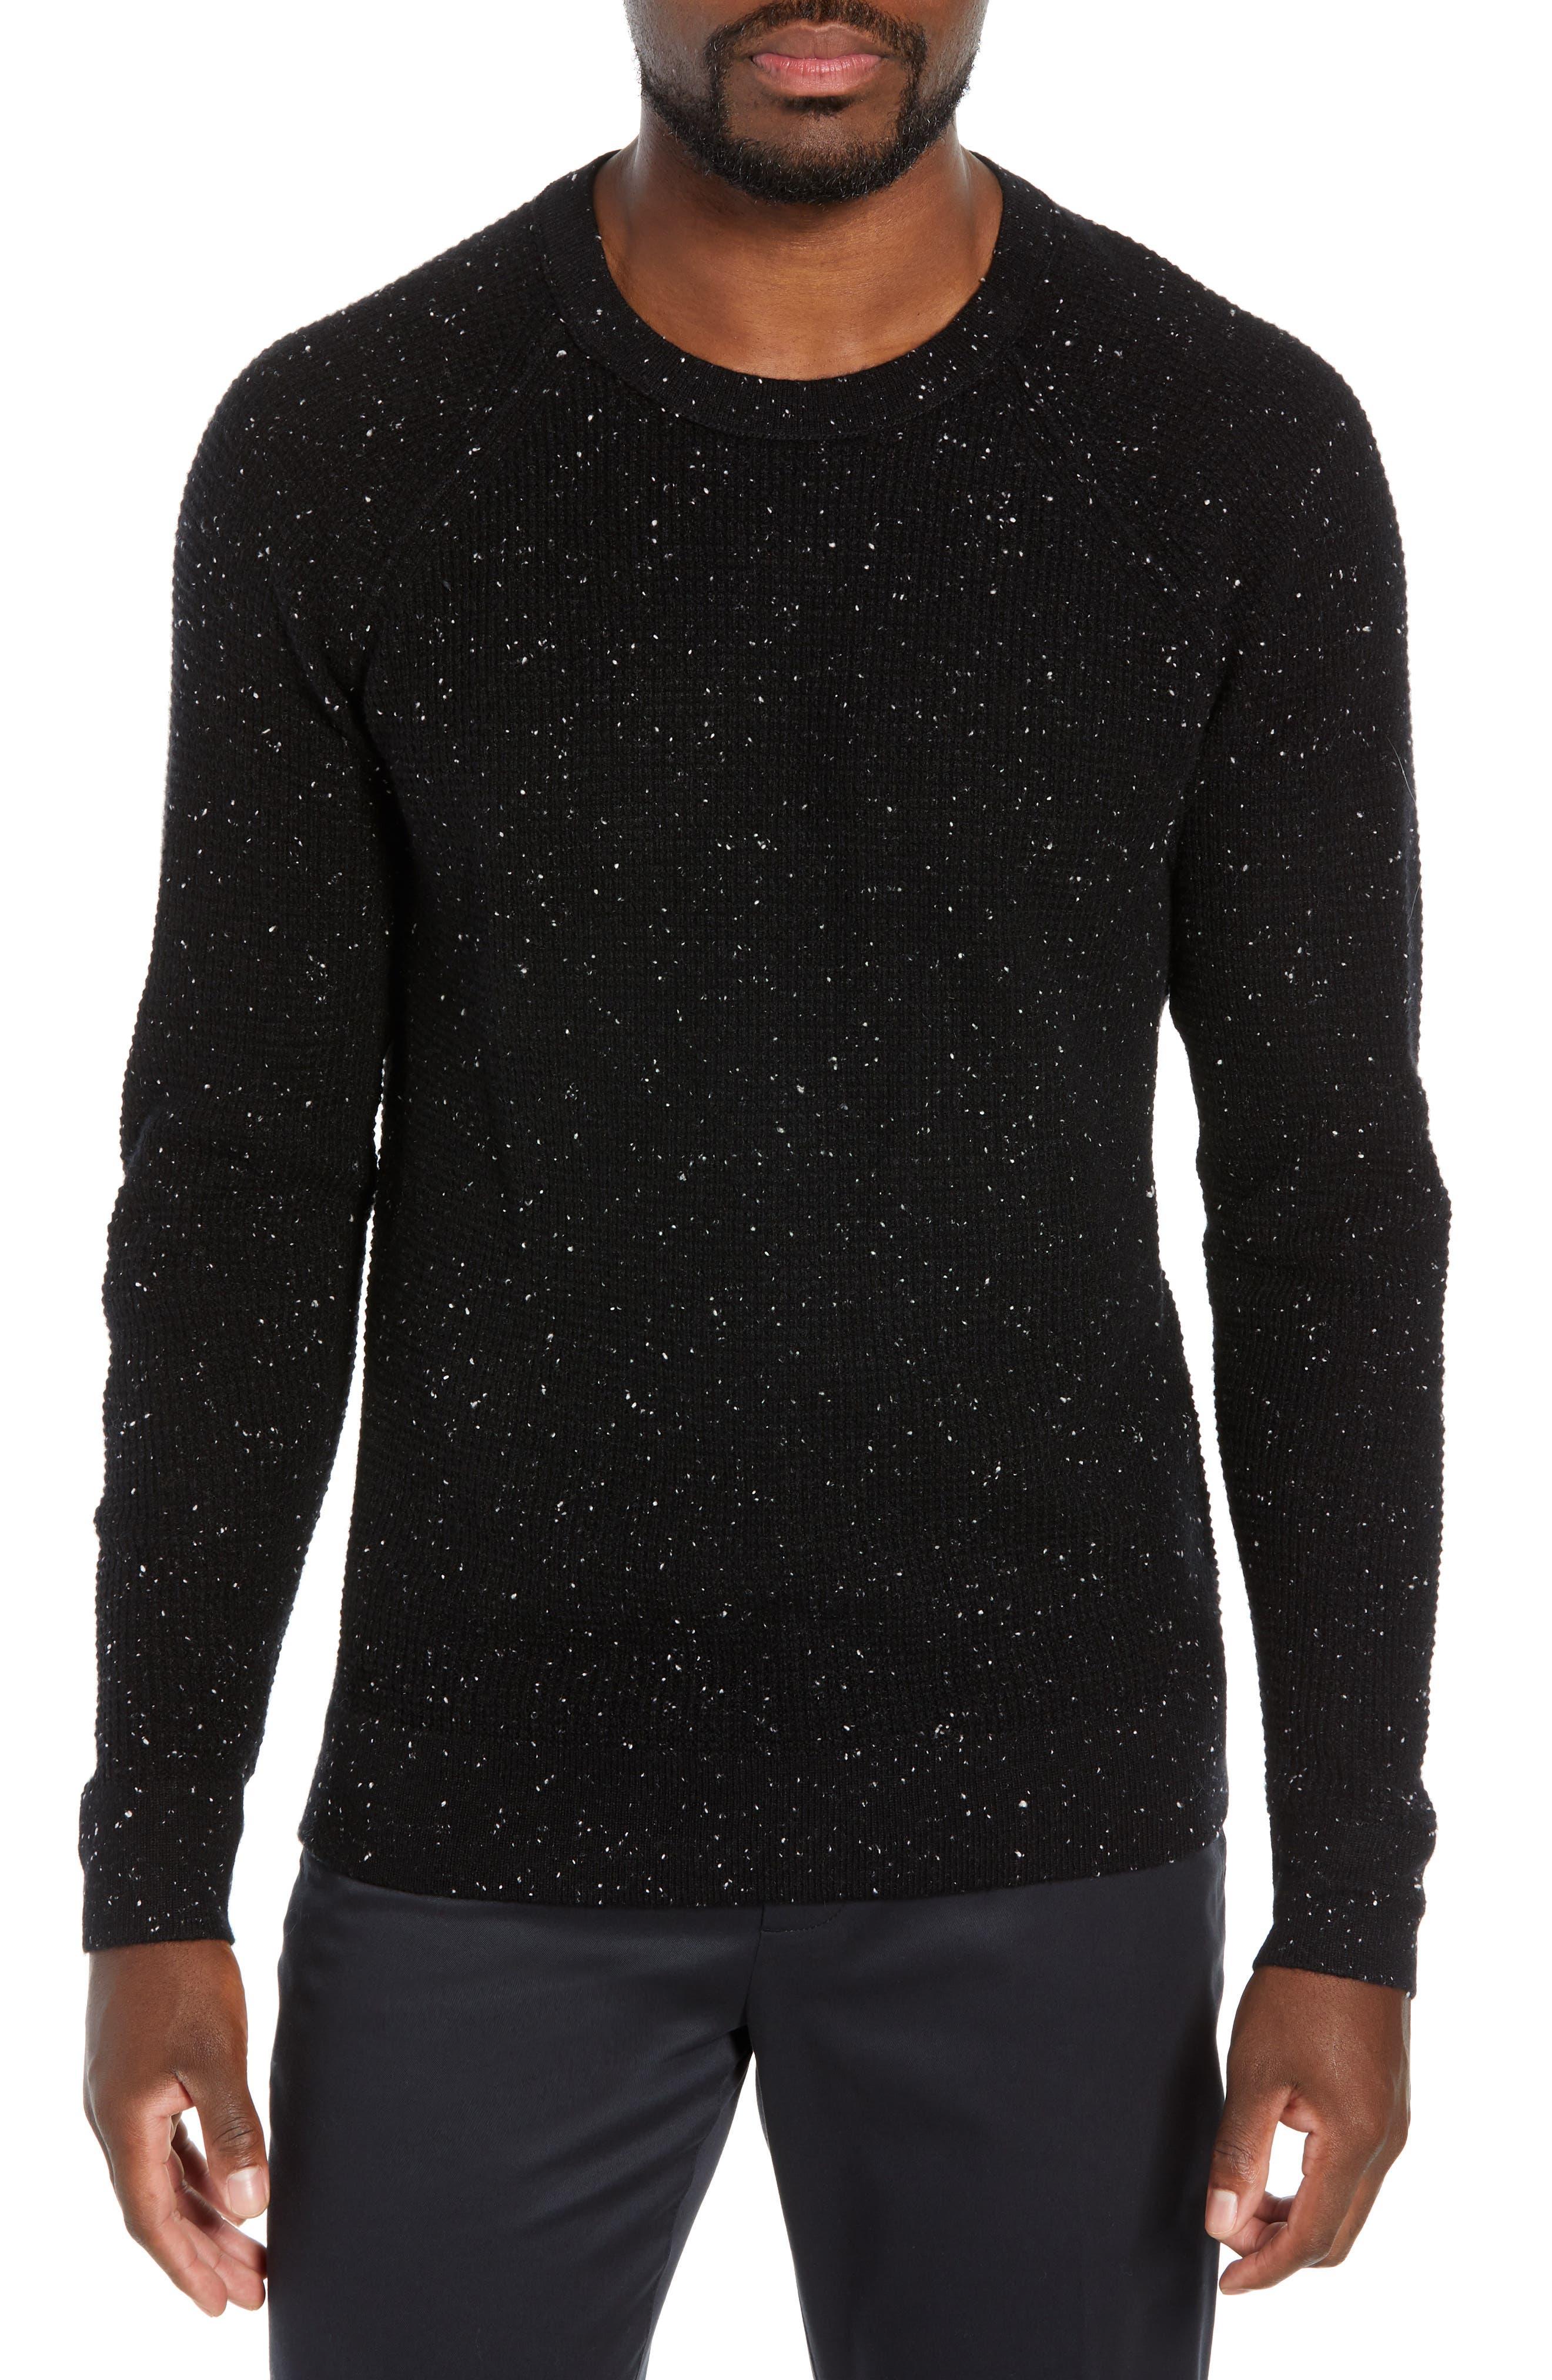 BONOBOS,                             Slim Fit Cashmere Sweater,                             Main thumbnail 1, color,                             001